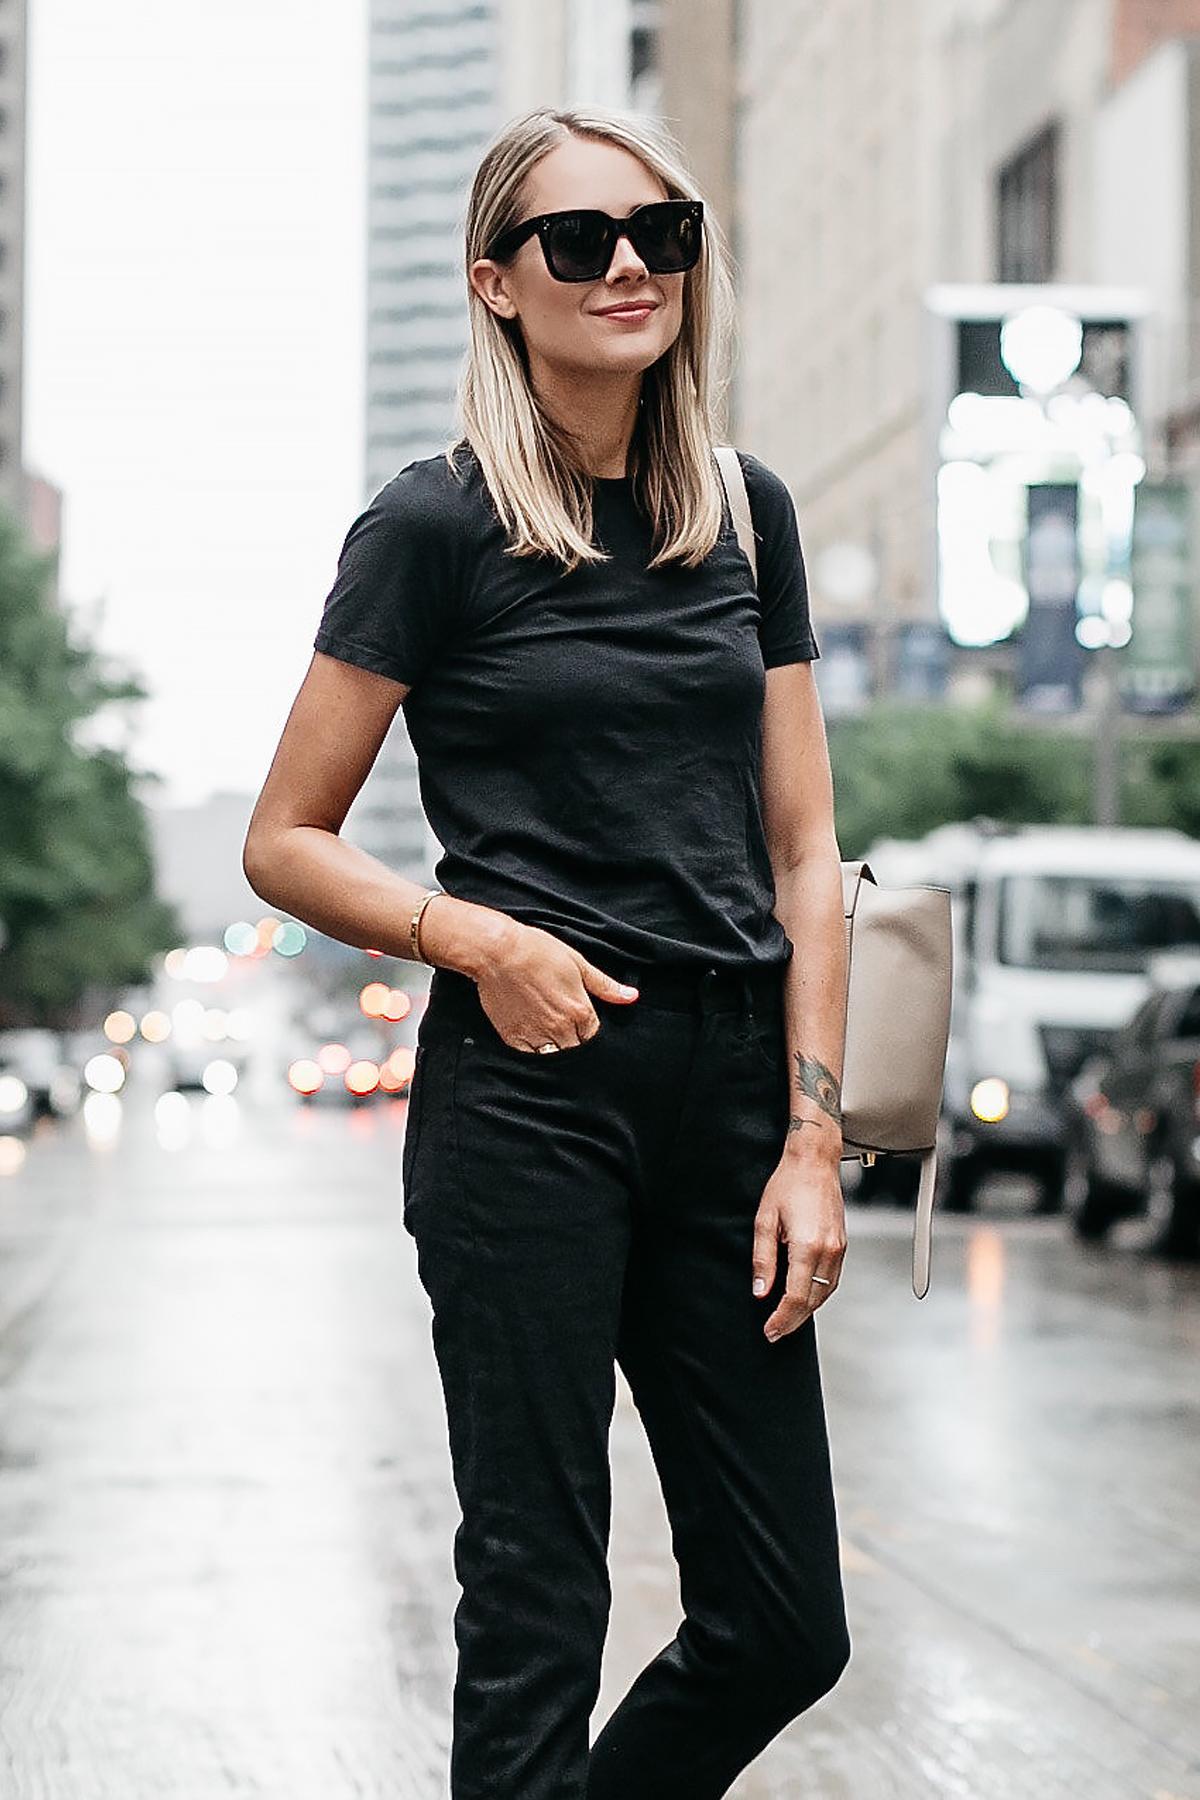 Blonde Woman Wearing Everlane Black Tshirt Everlane Black Boyfriend Jeans Fashion Jackson Dallas Blogger Fashion Blogger Street Style